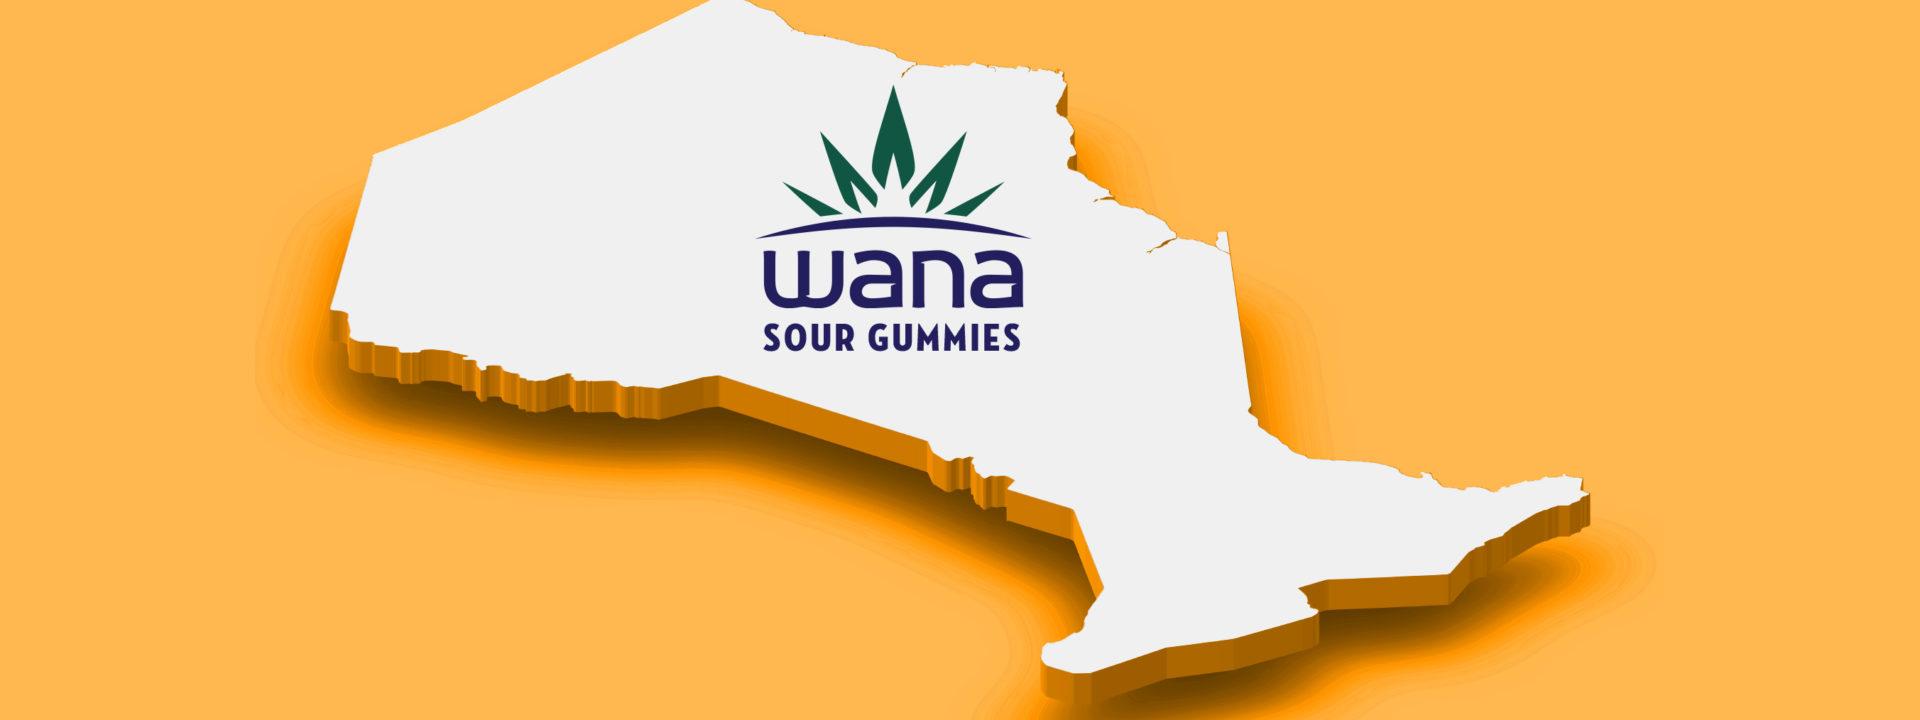 Press Release – Indiva Begins Shipments of Wana™ Sour Gummies